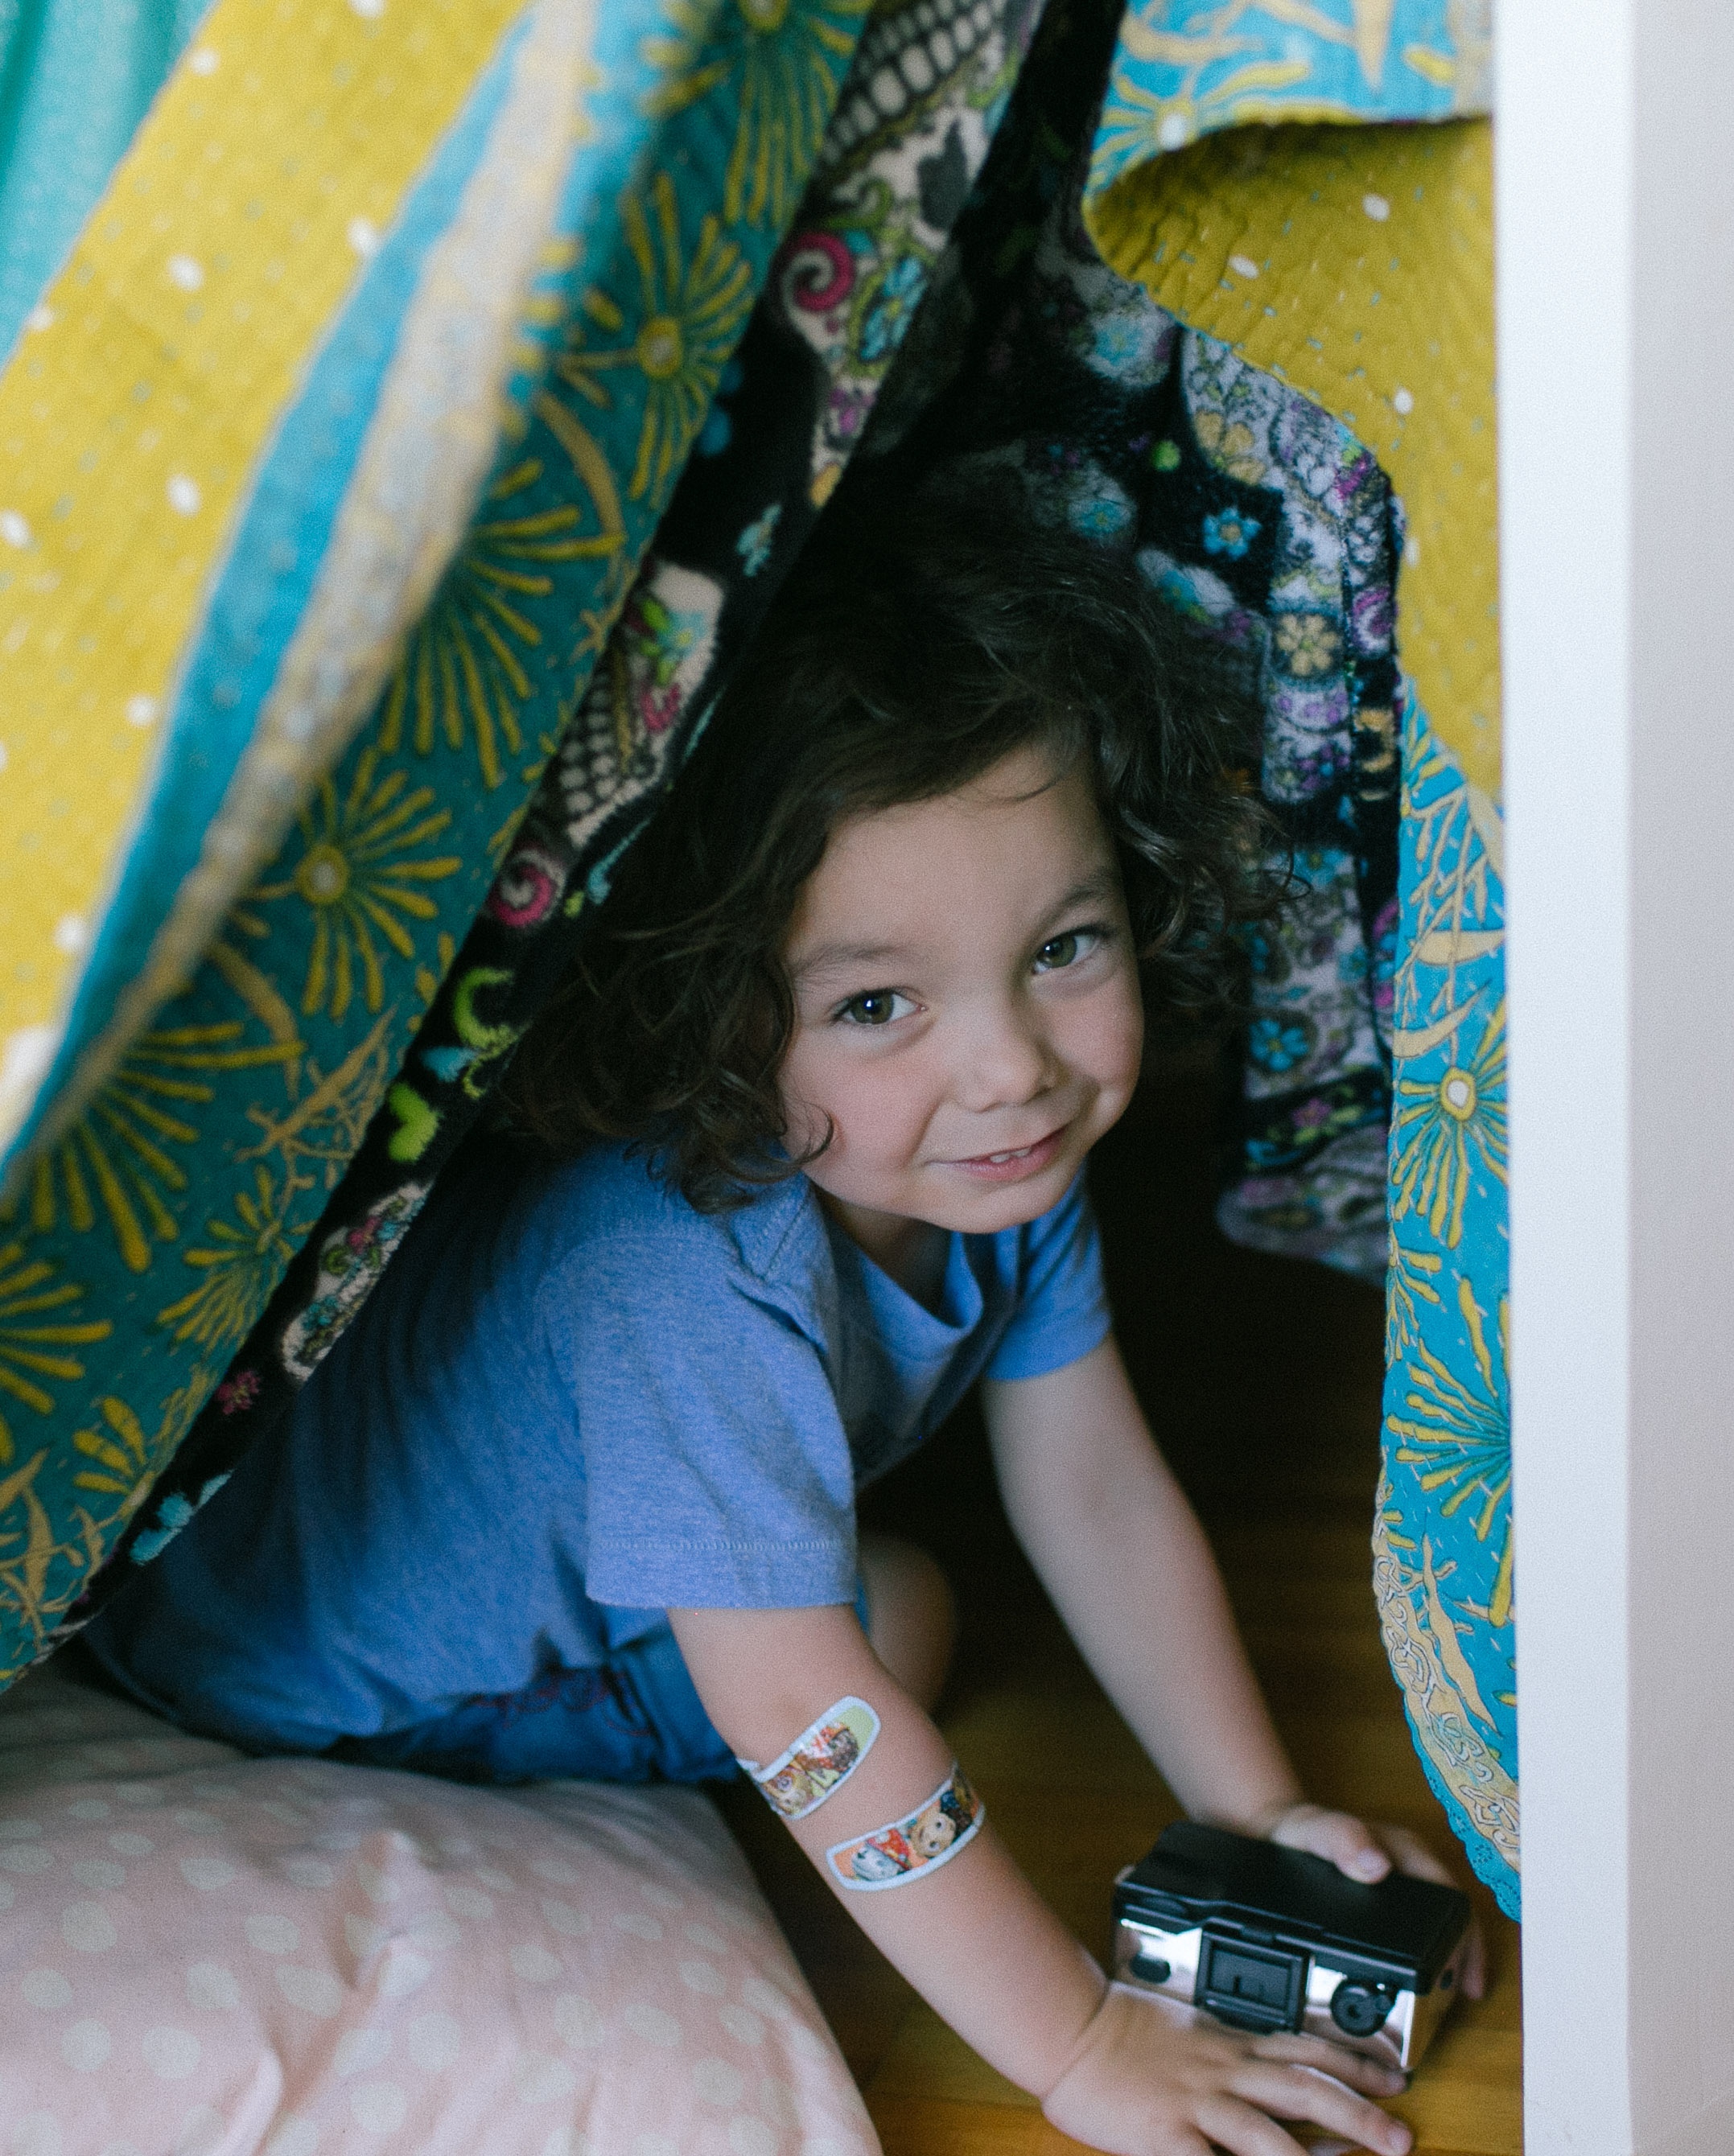 family portrait seattle photographer toddler kids bellevue lifestyle-7.jpg